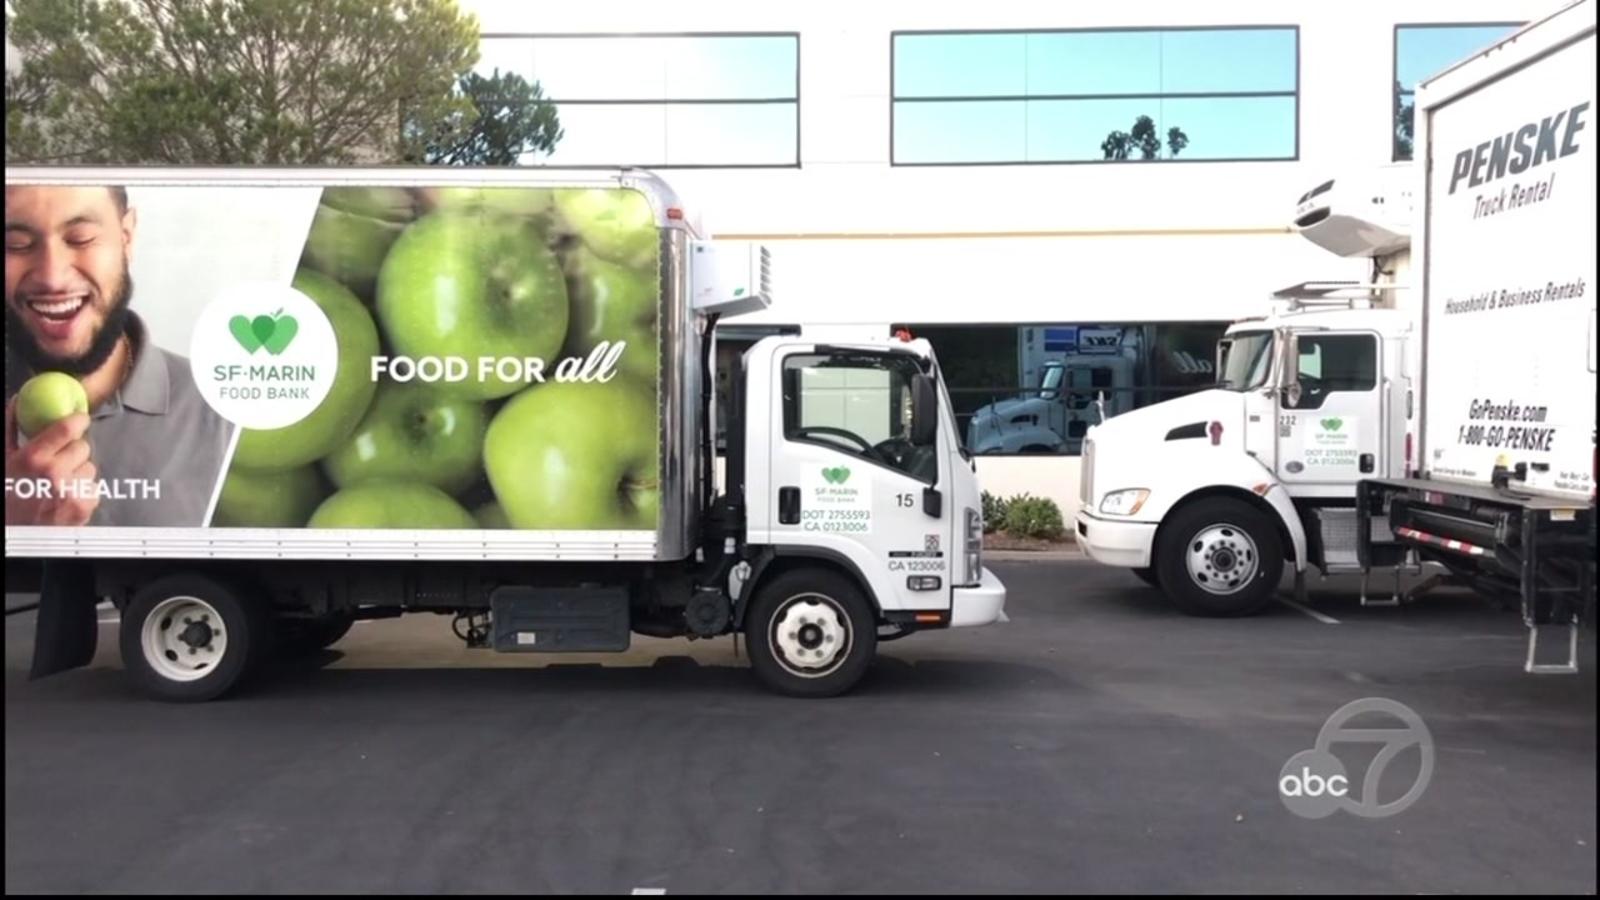 Vandals damage gas tanks of 5 delivery trucks belonging to North Bay food bank